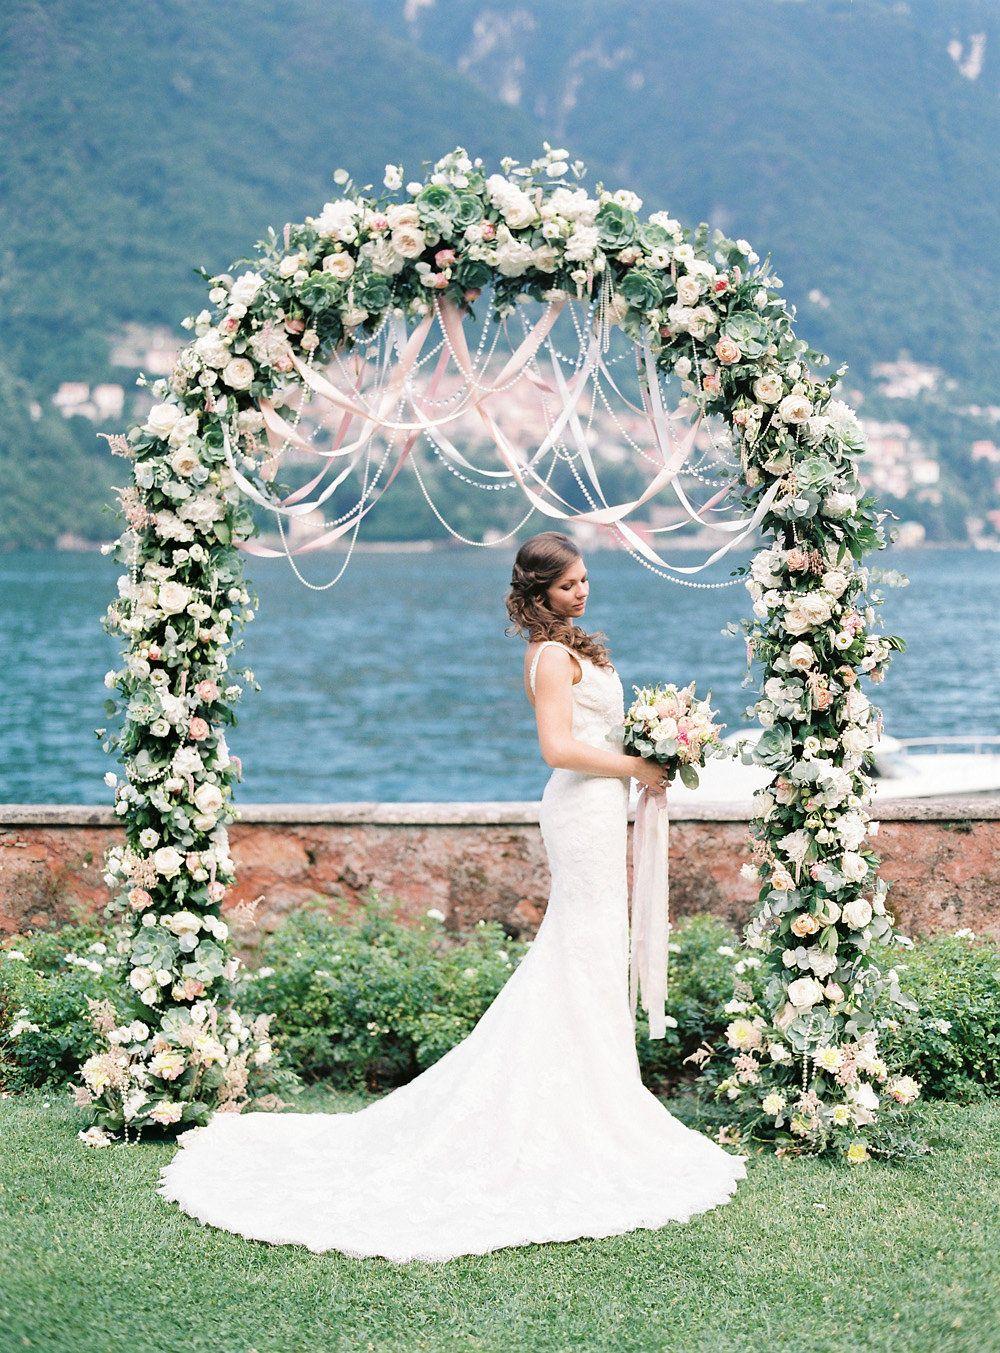 Wedding decorations arch  WEDDING  Свадьба от А до Я  Wedding  Pinterest  Wedding and Weddings